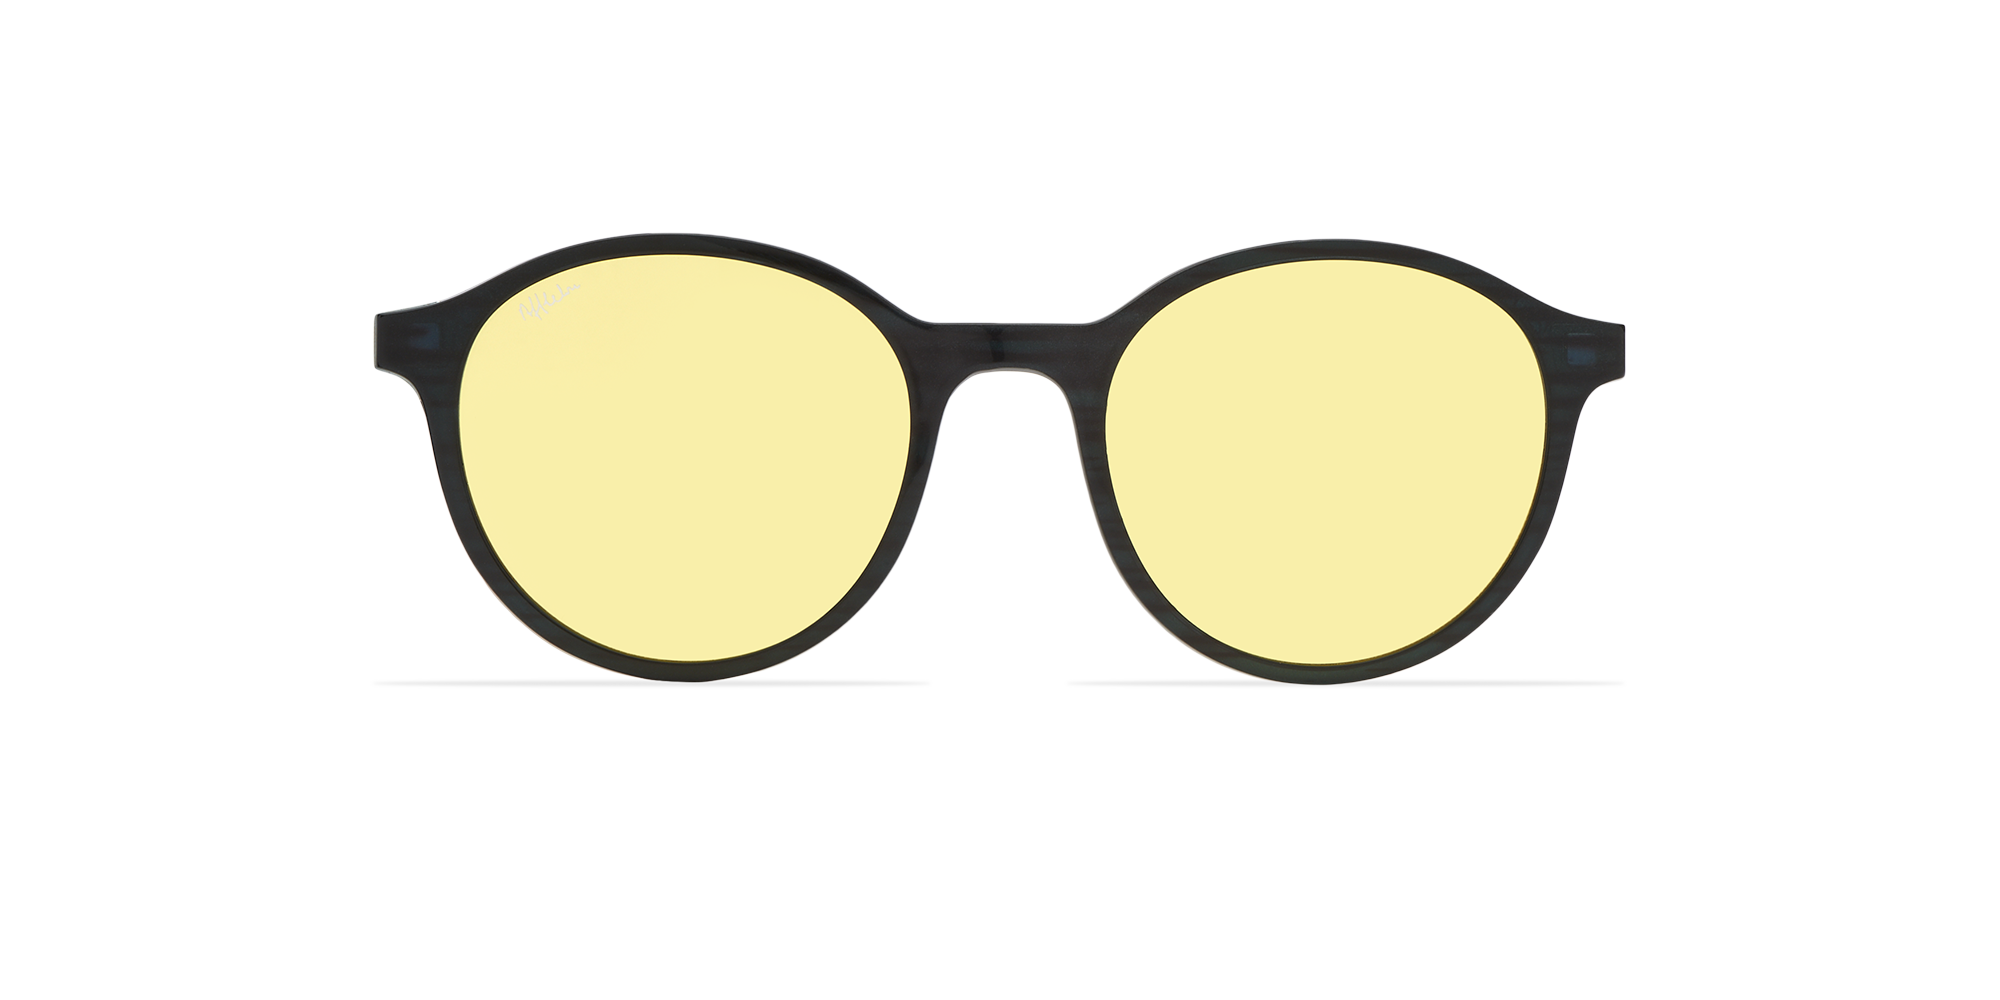 afflelou/france/products/smart_clip/clips_glasses/TMK37YEGR014919.png